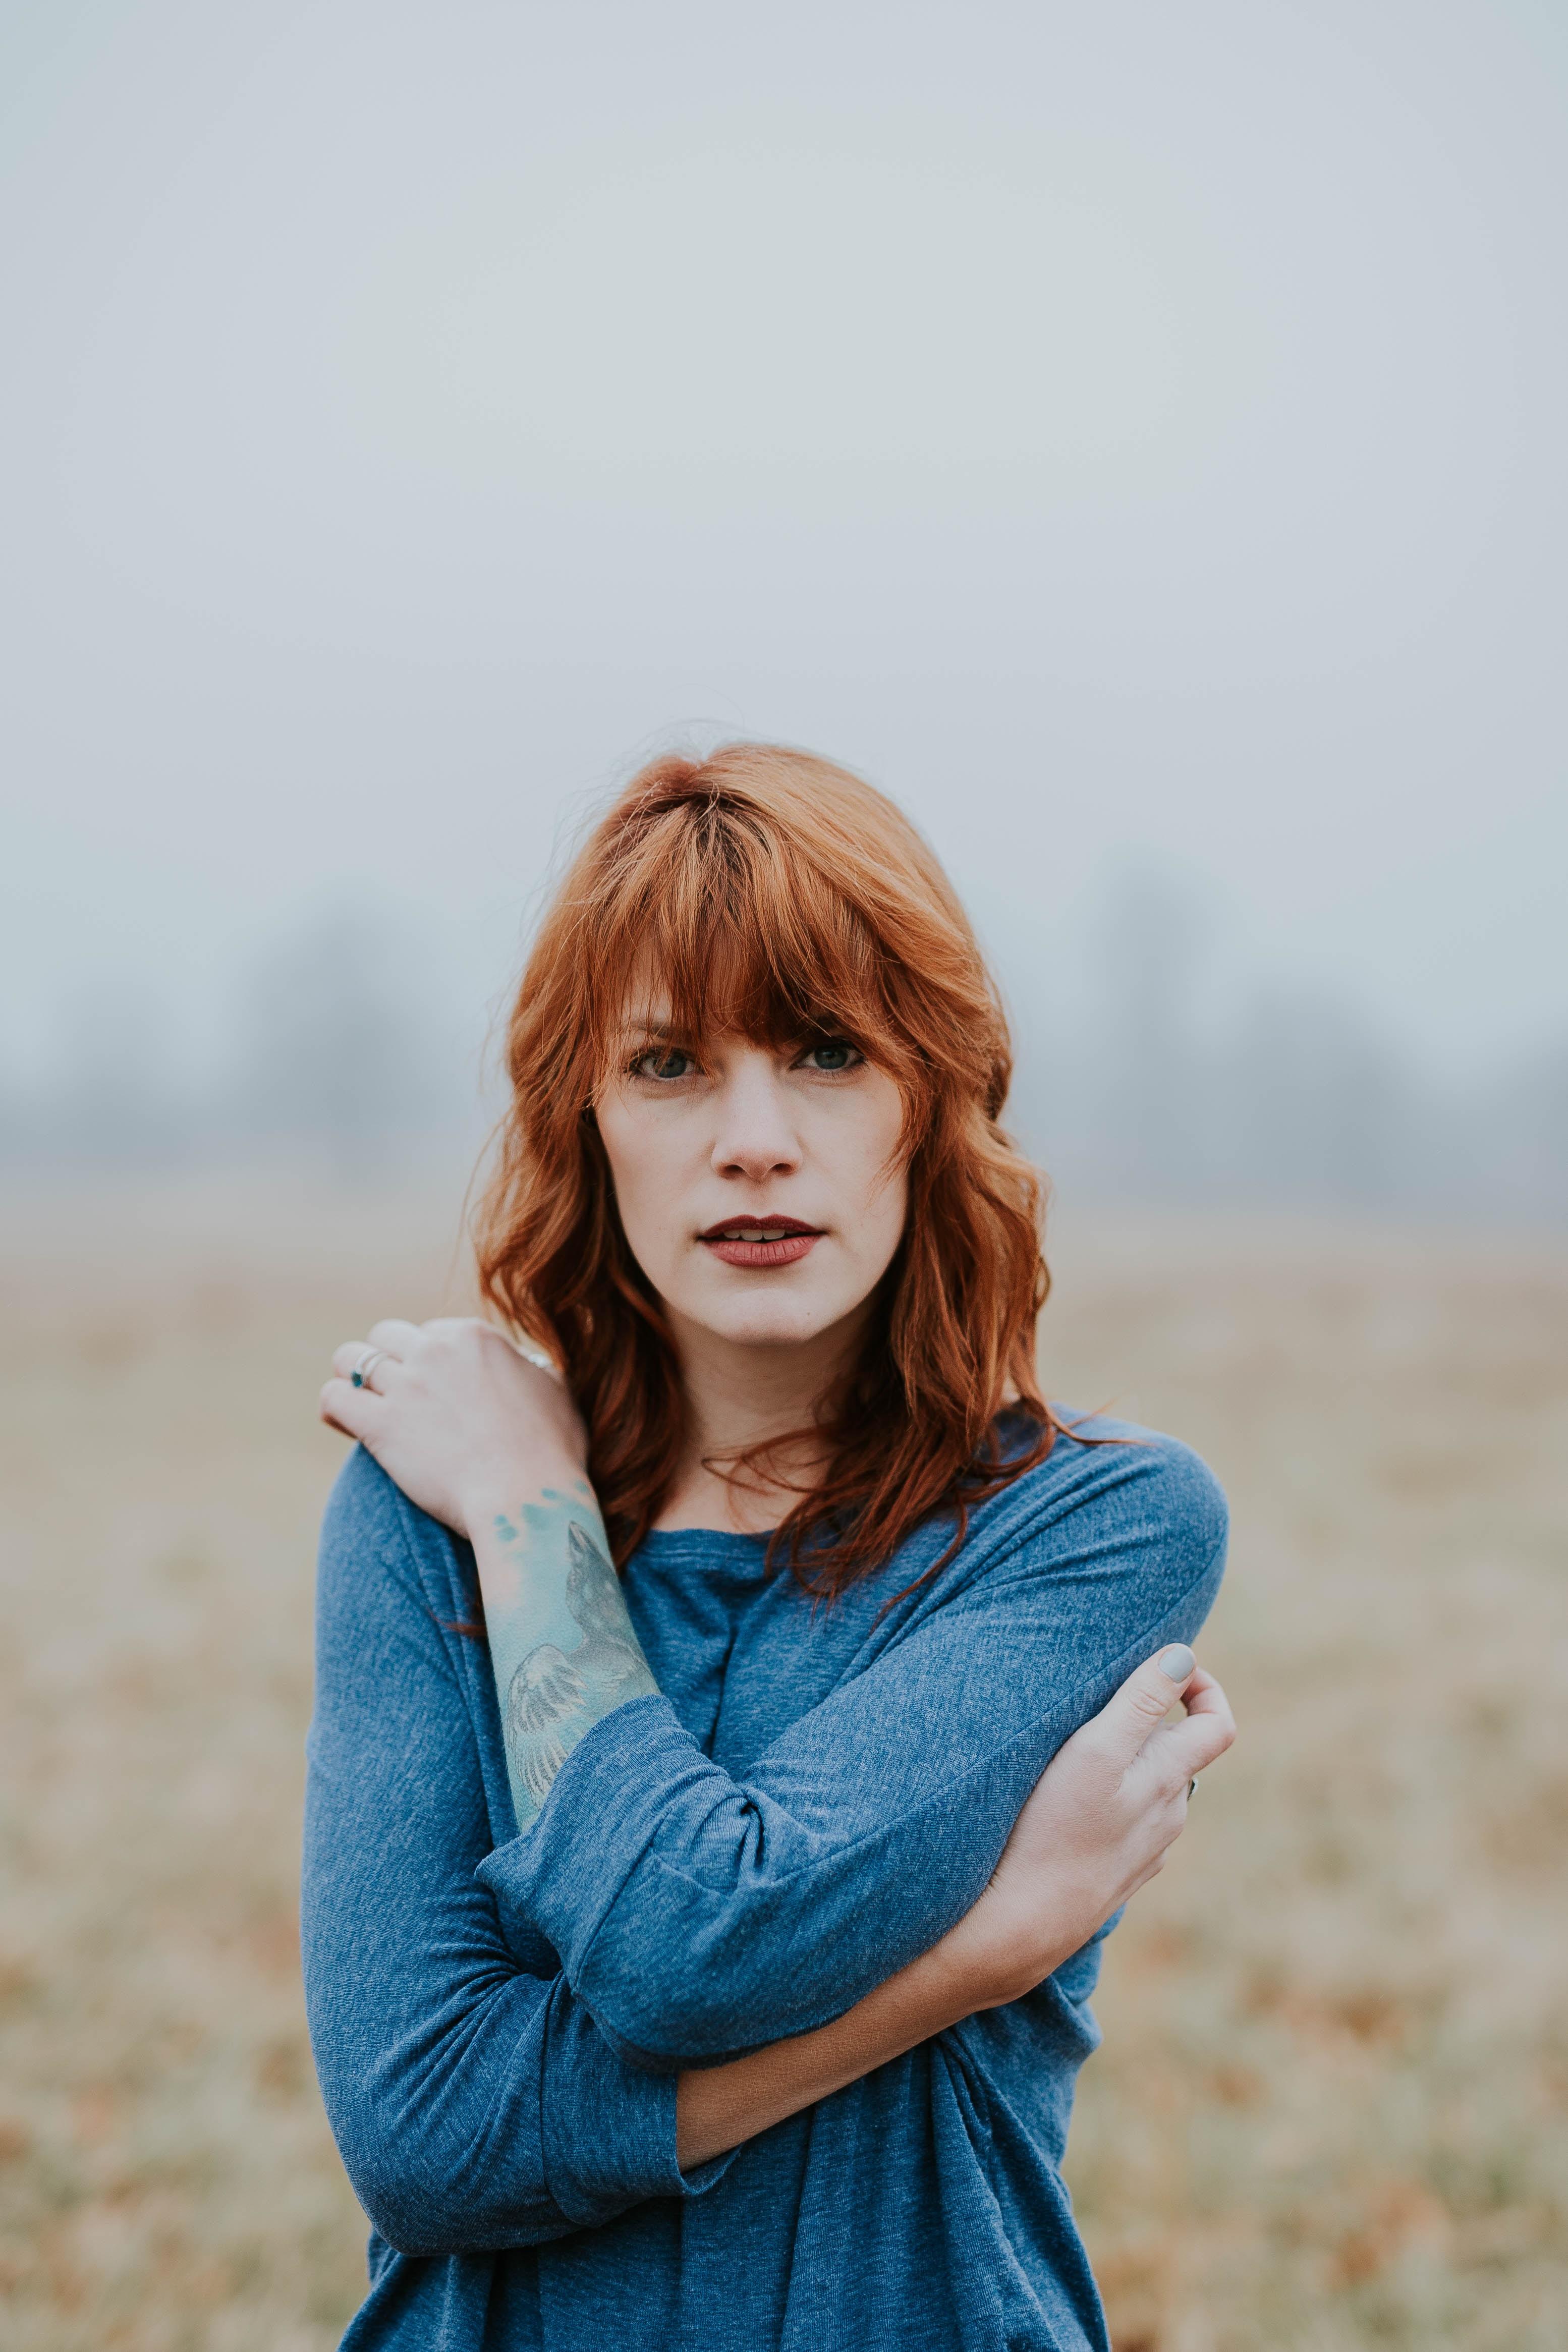 Portrait of woman looking contemplative in a field